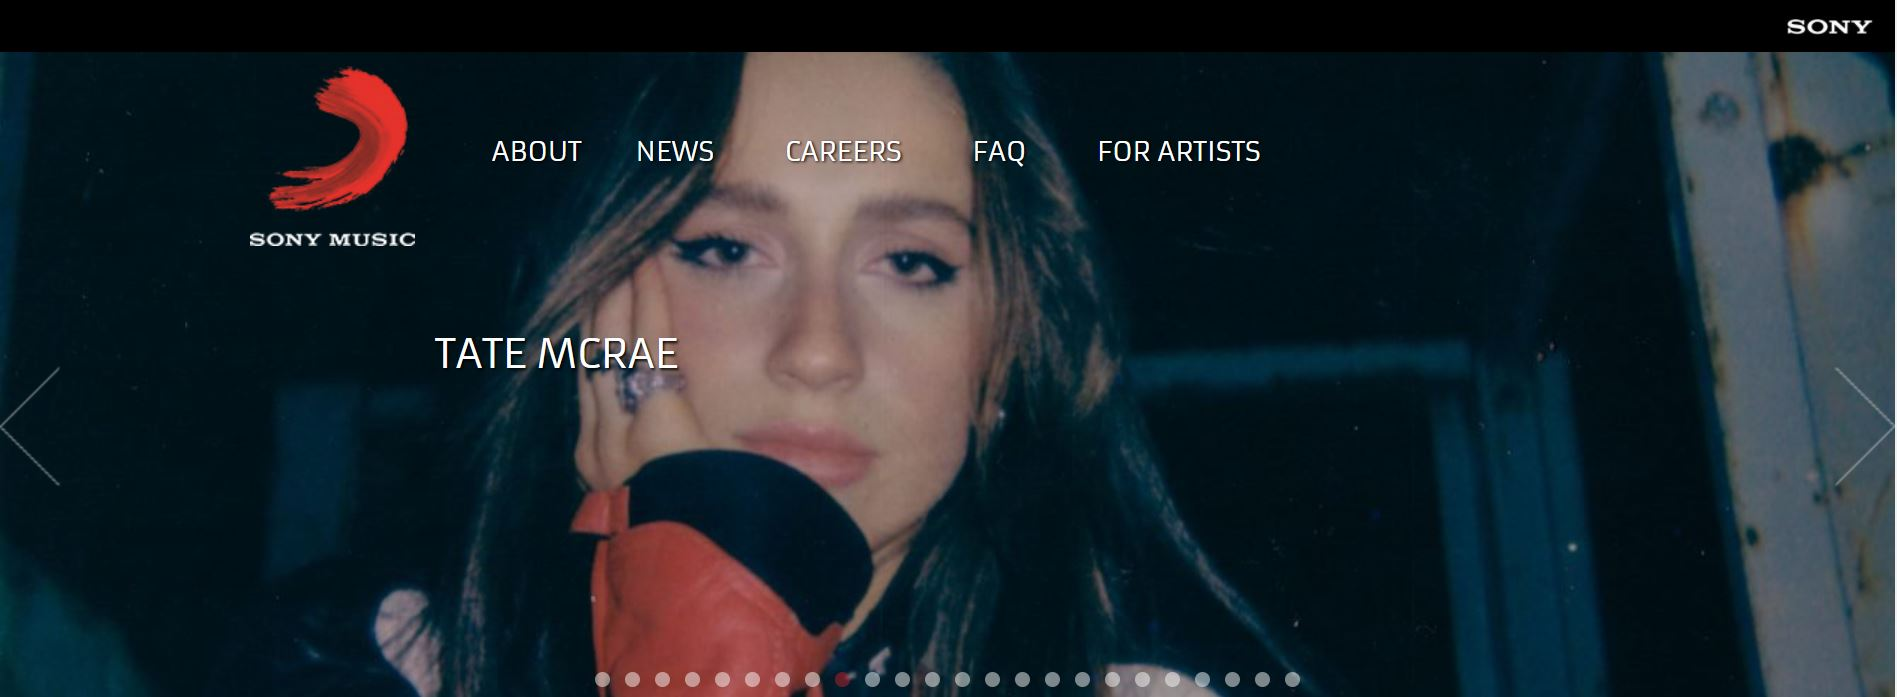 Sony Music website